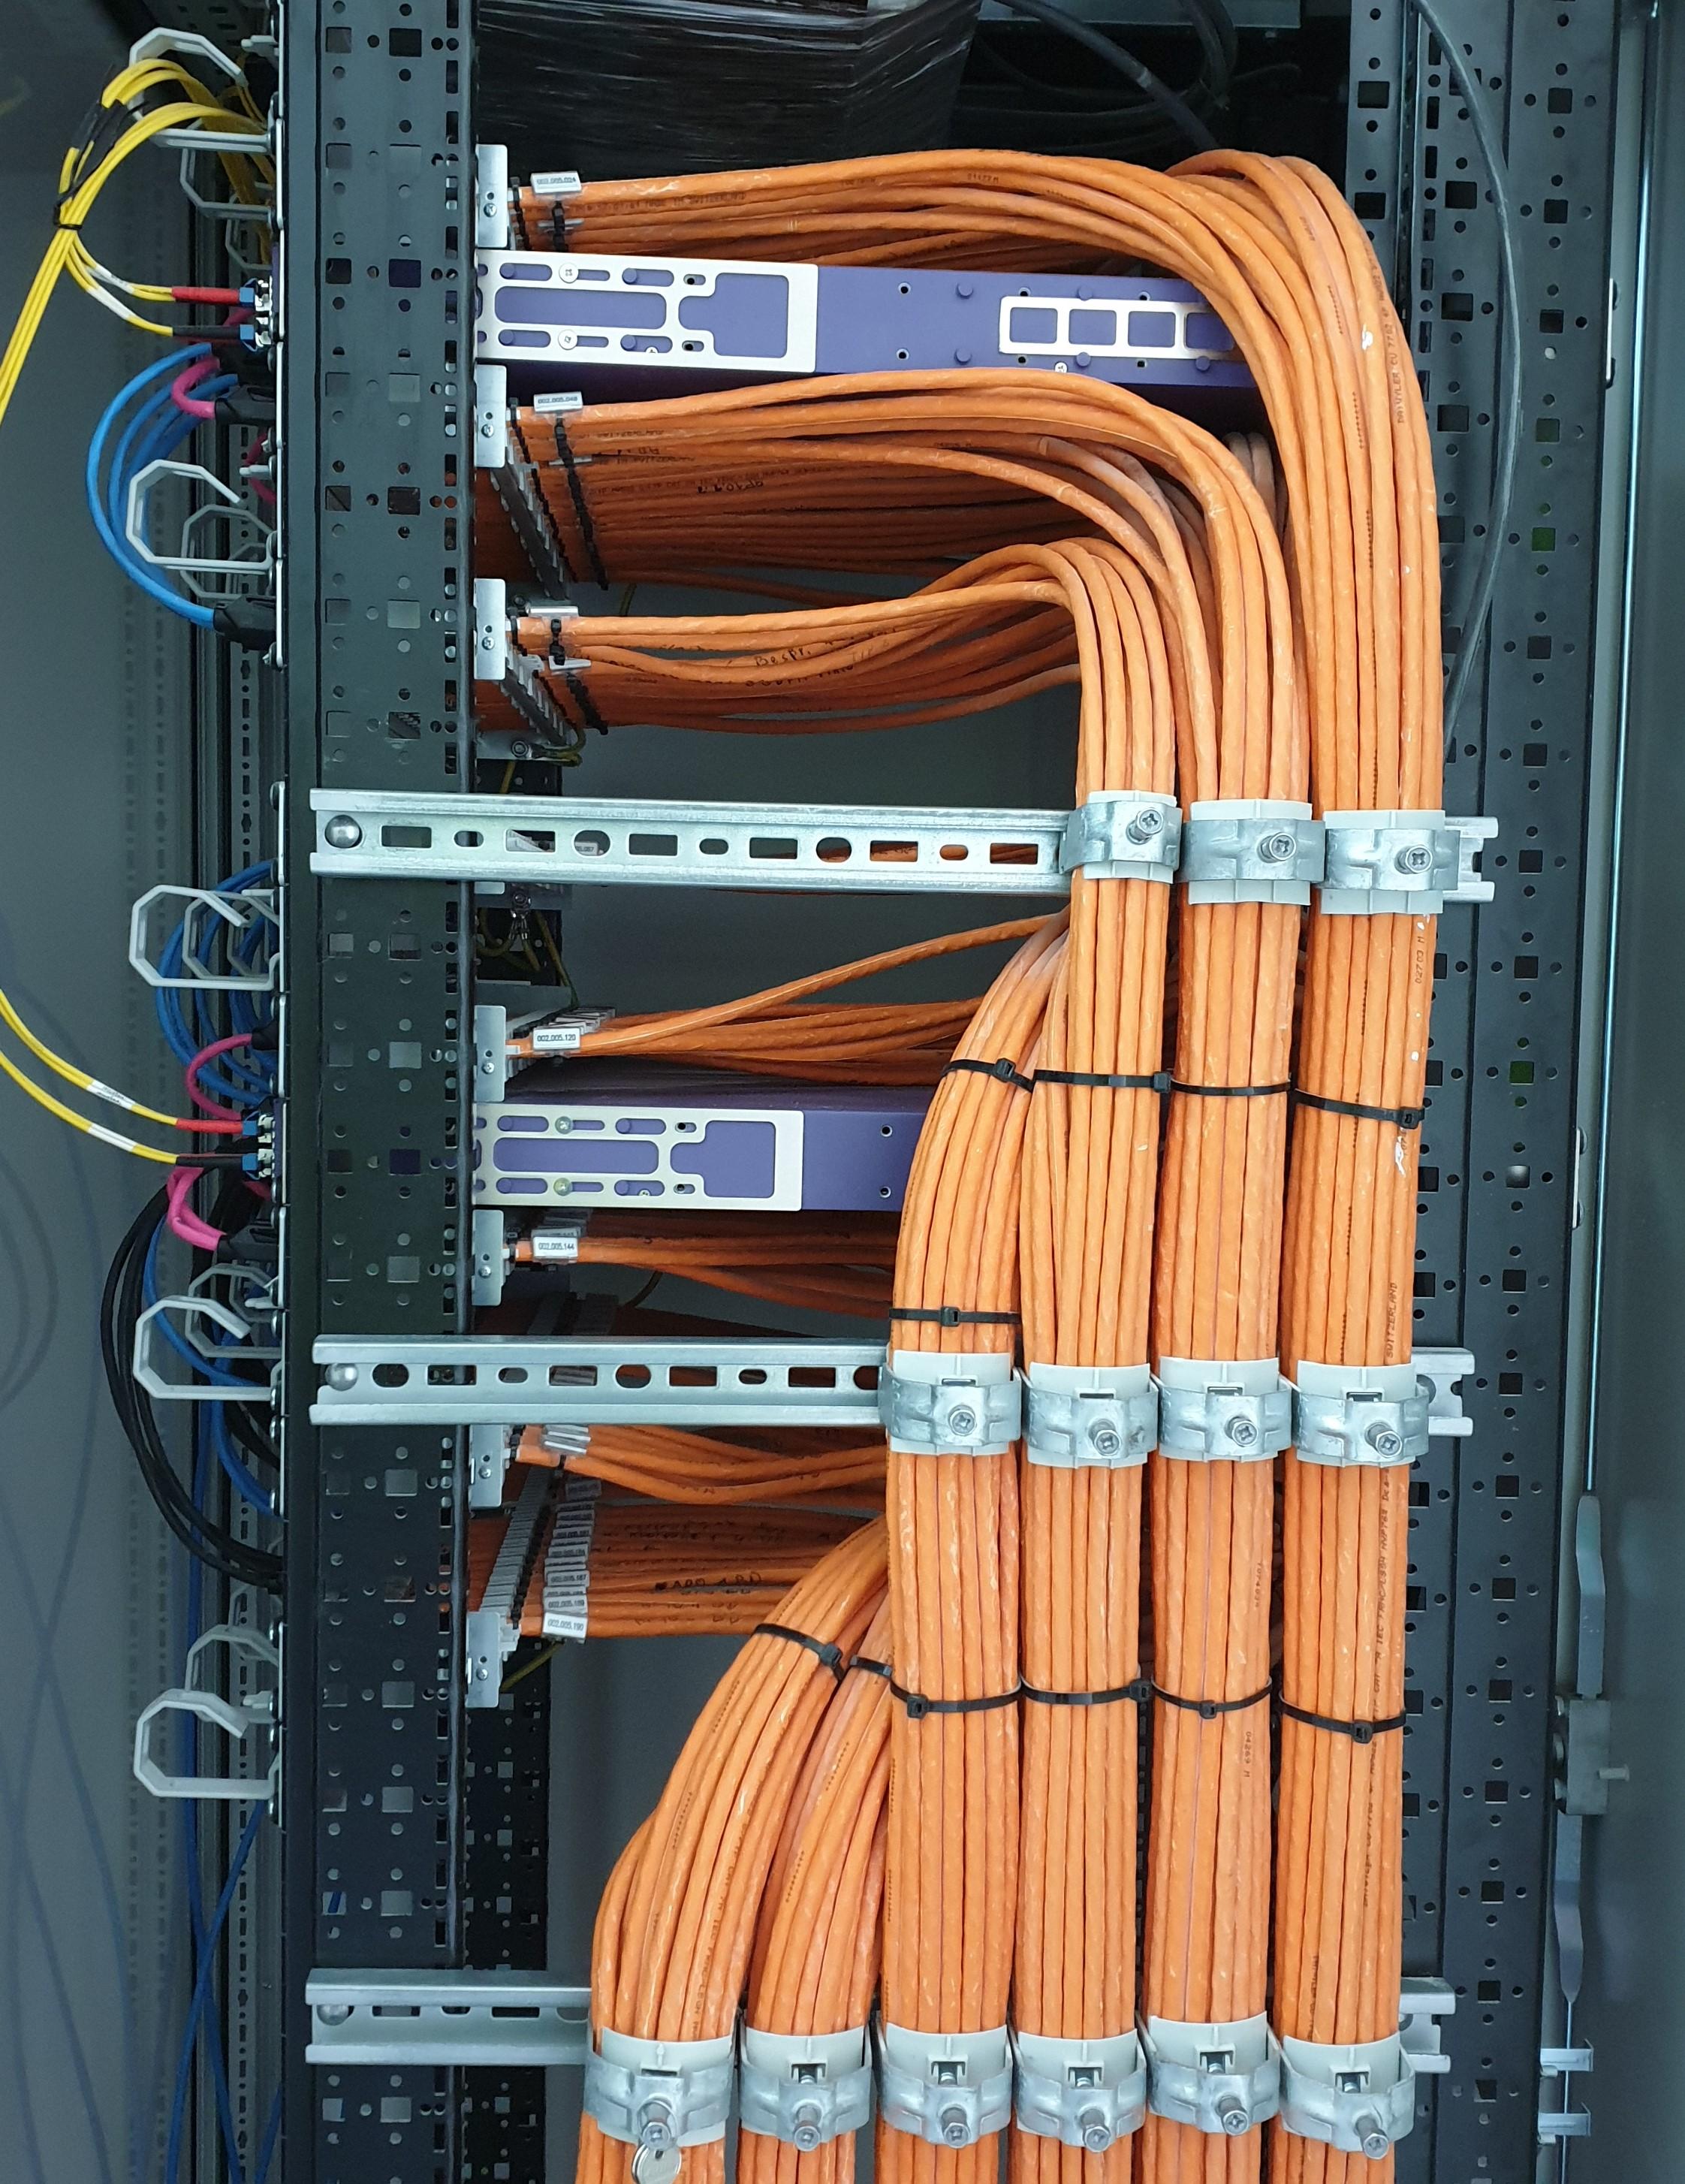 Bild Elektro Datentechnik